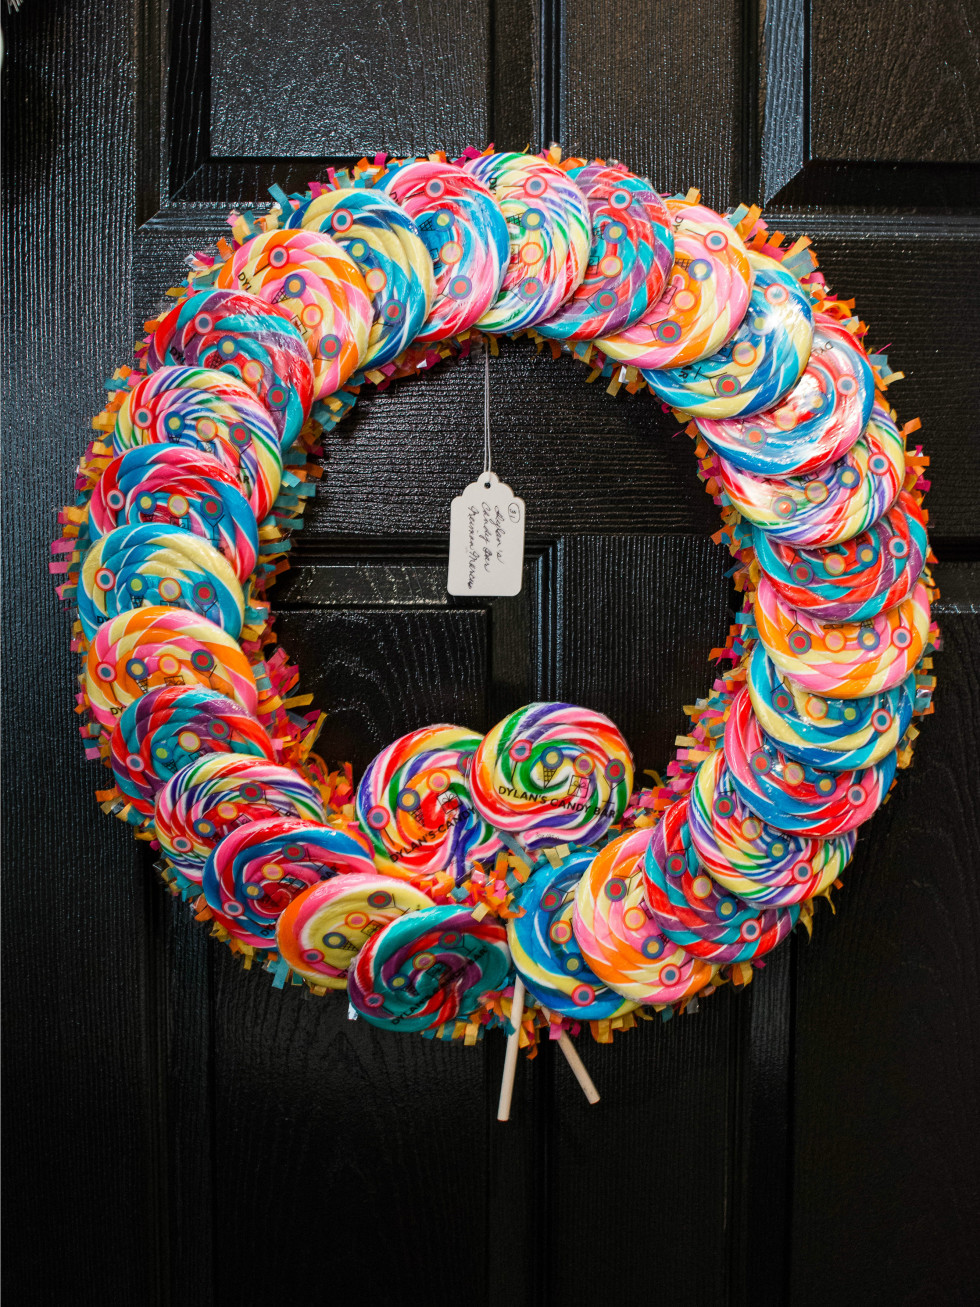 Dylan's Candy Bar Neiman Marcus wreath